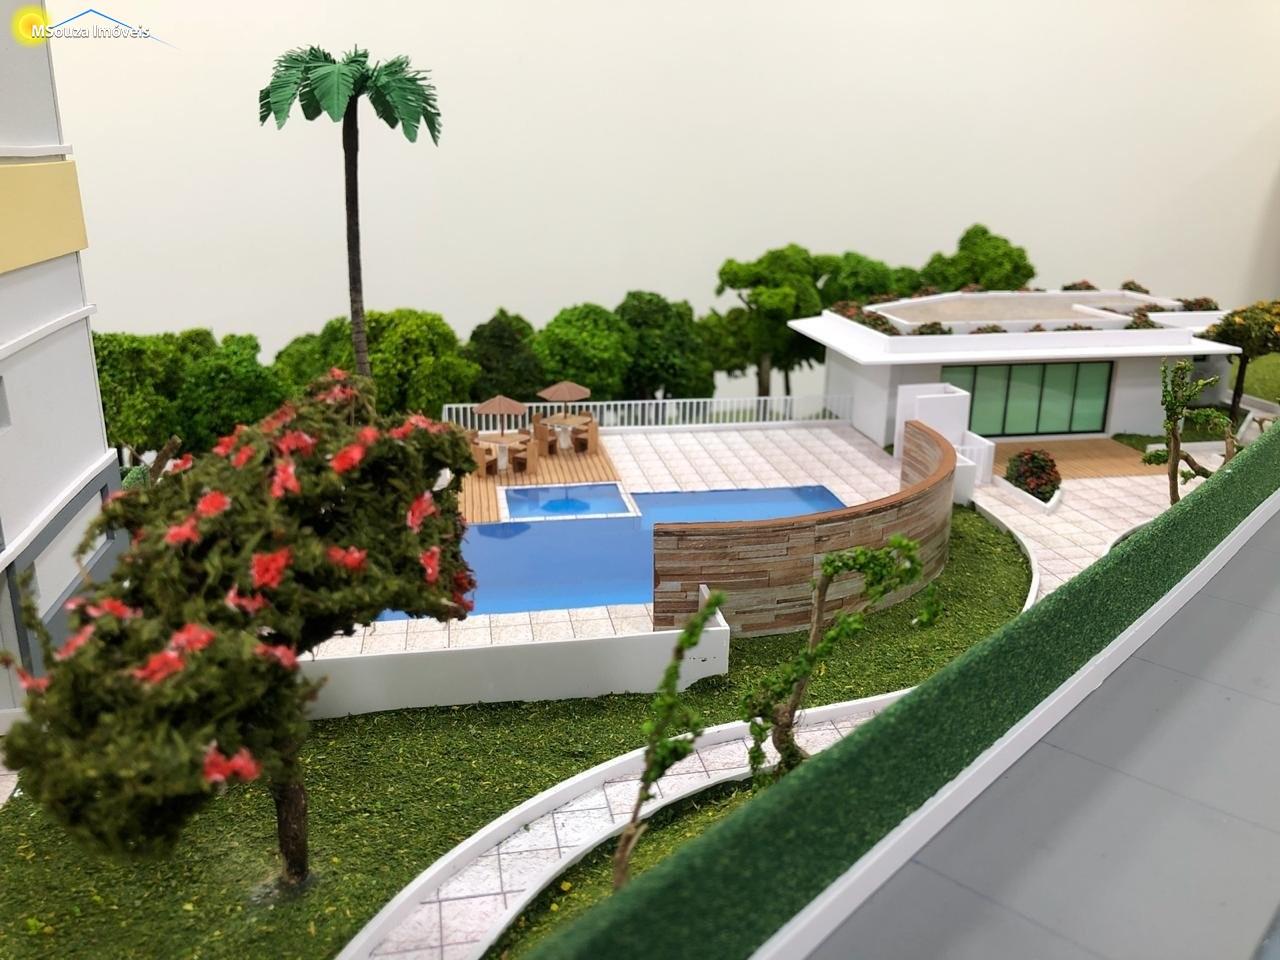 Apartamento 2 Qts • Venda • Samambaia - Petrópolis/RJ [ Cód.: MS0036 ]